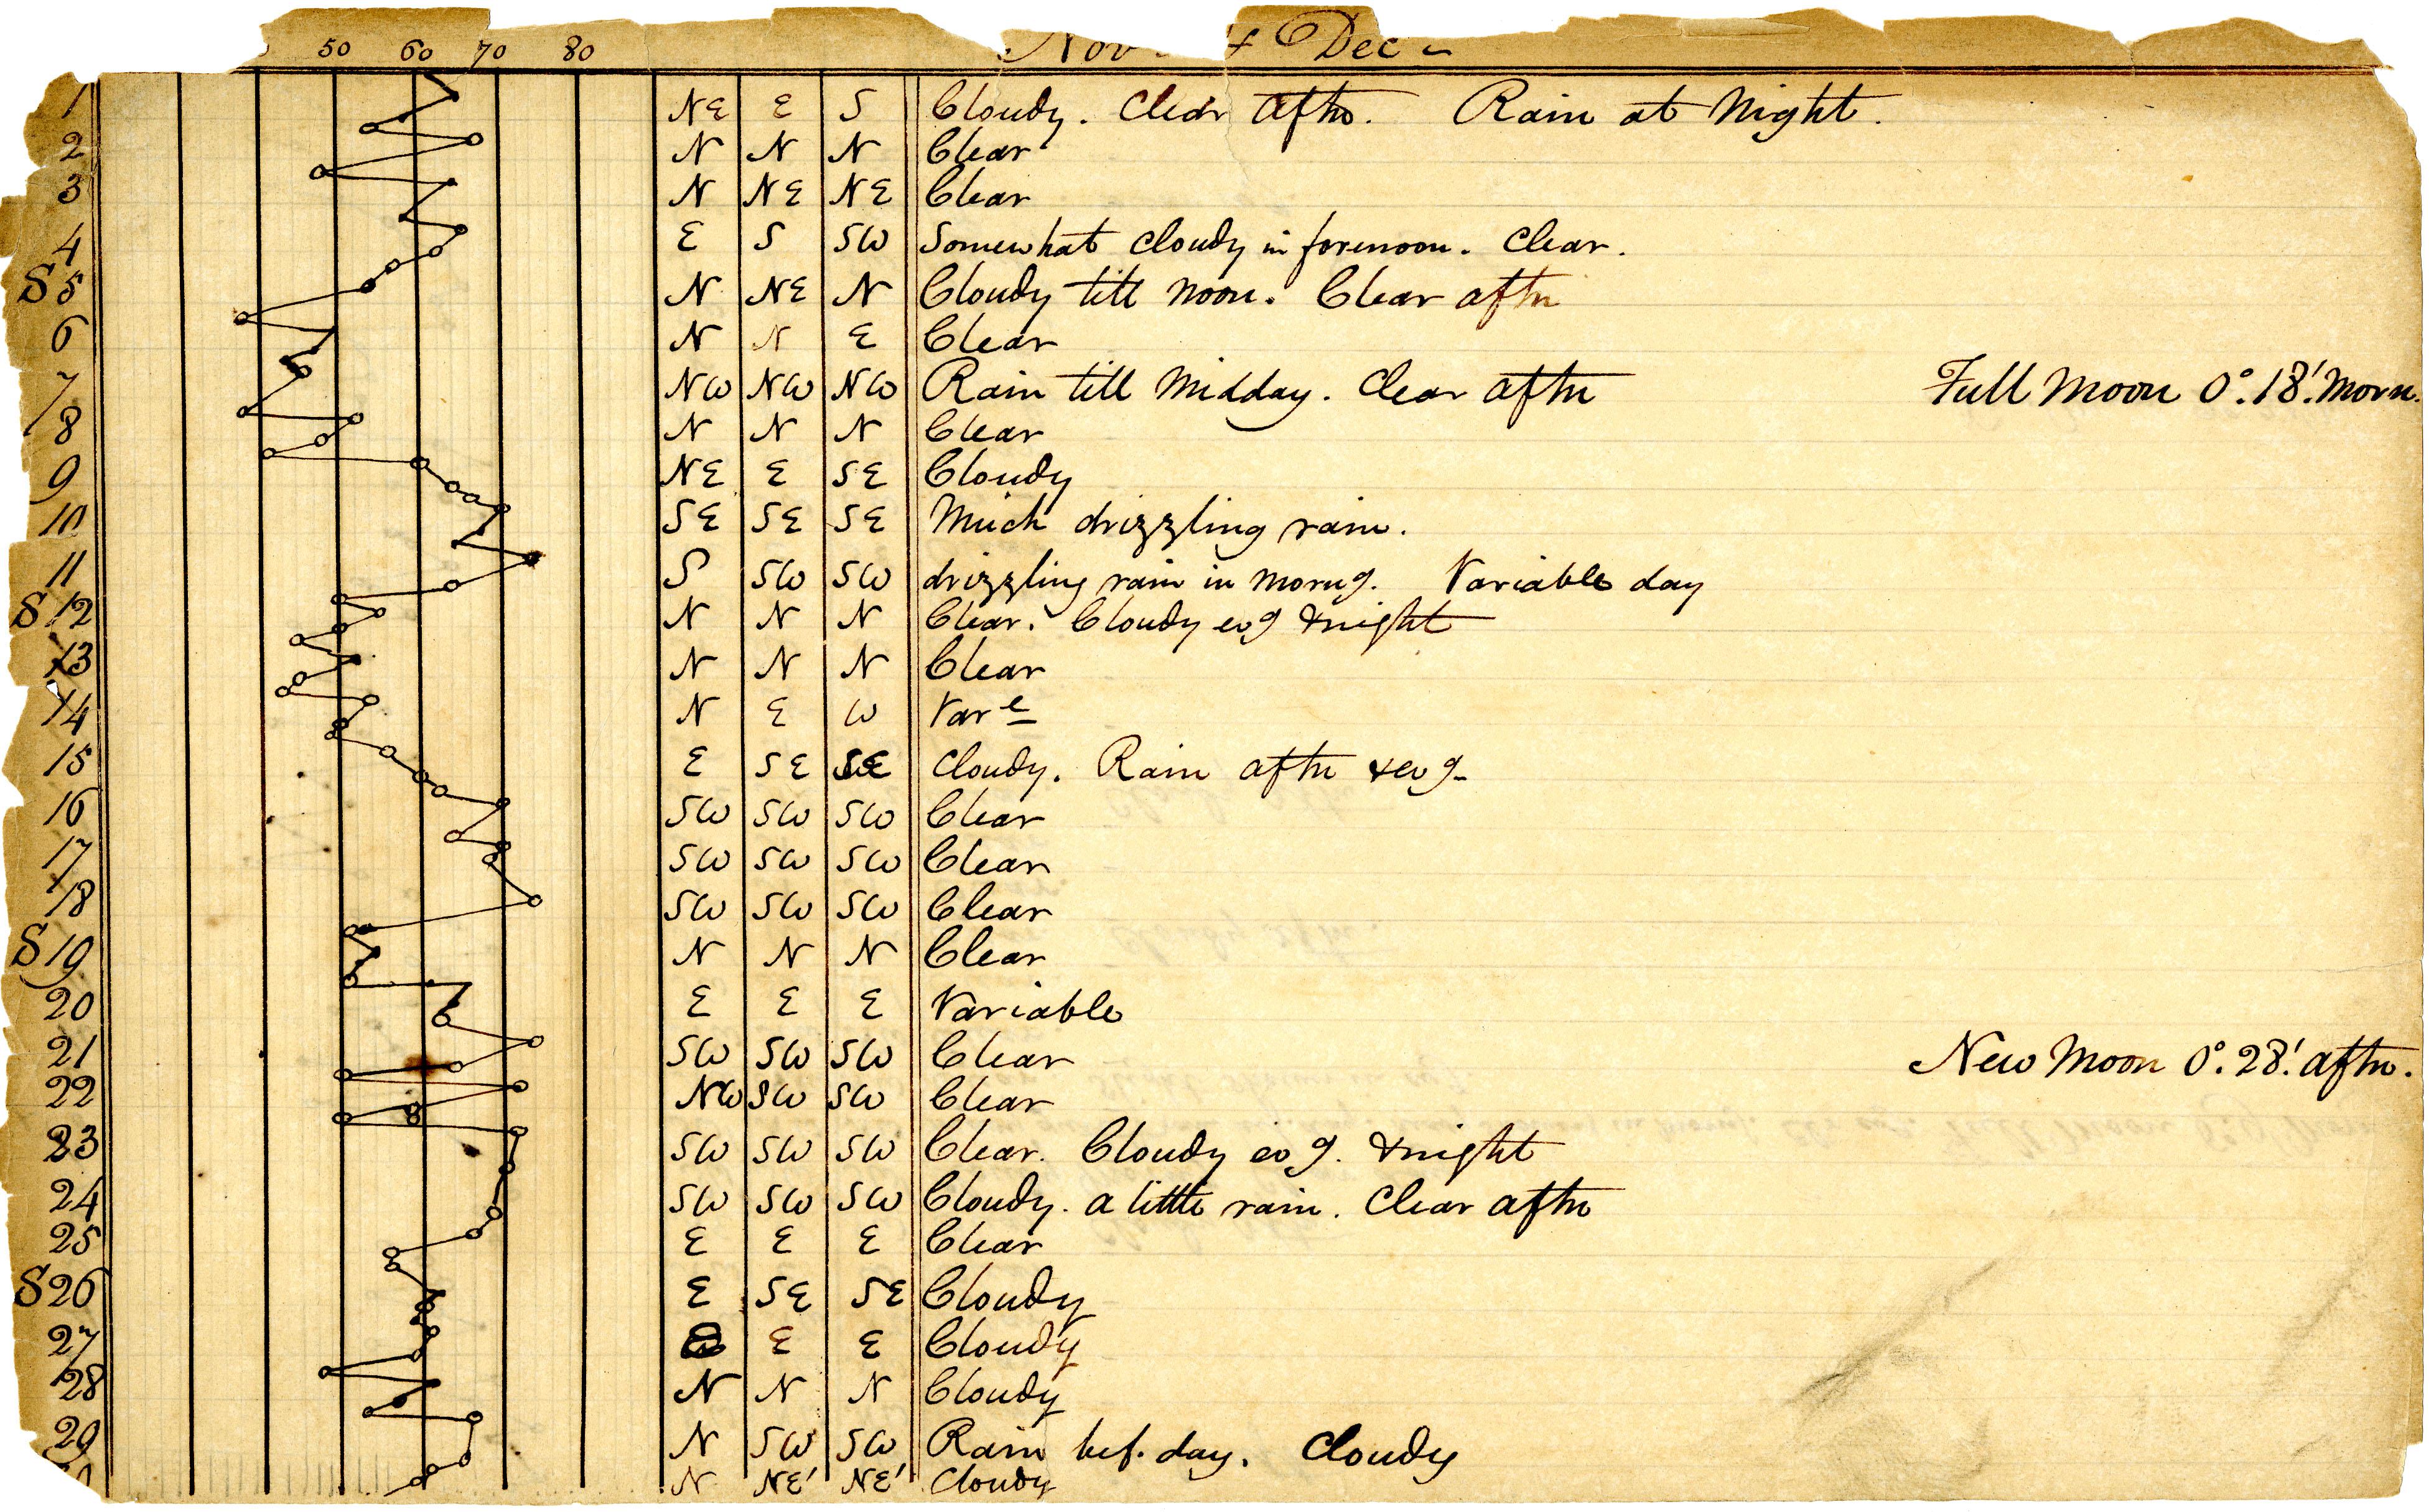 Volume 1: Daily Meteorological Observations, November 1843